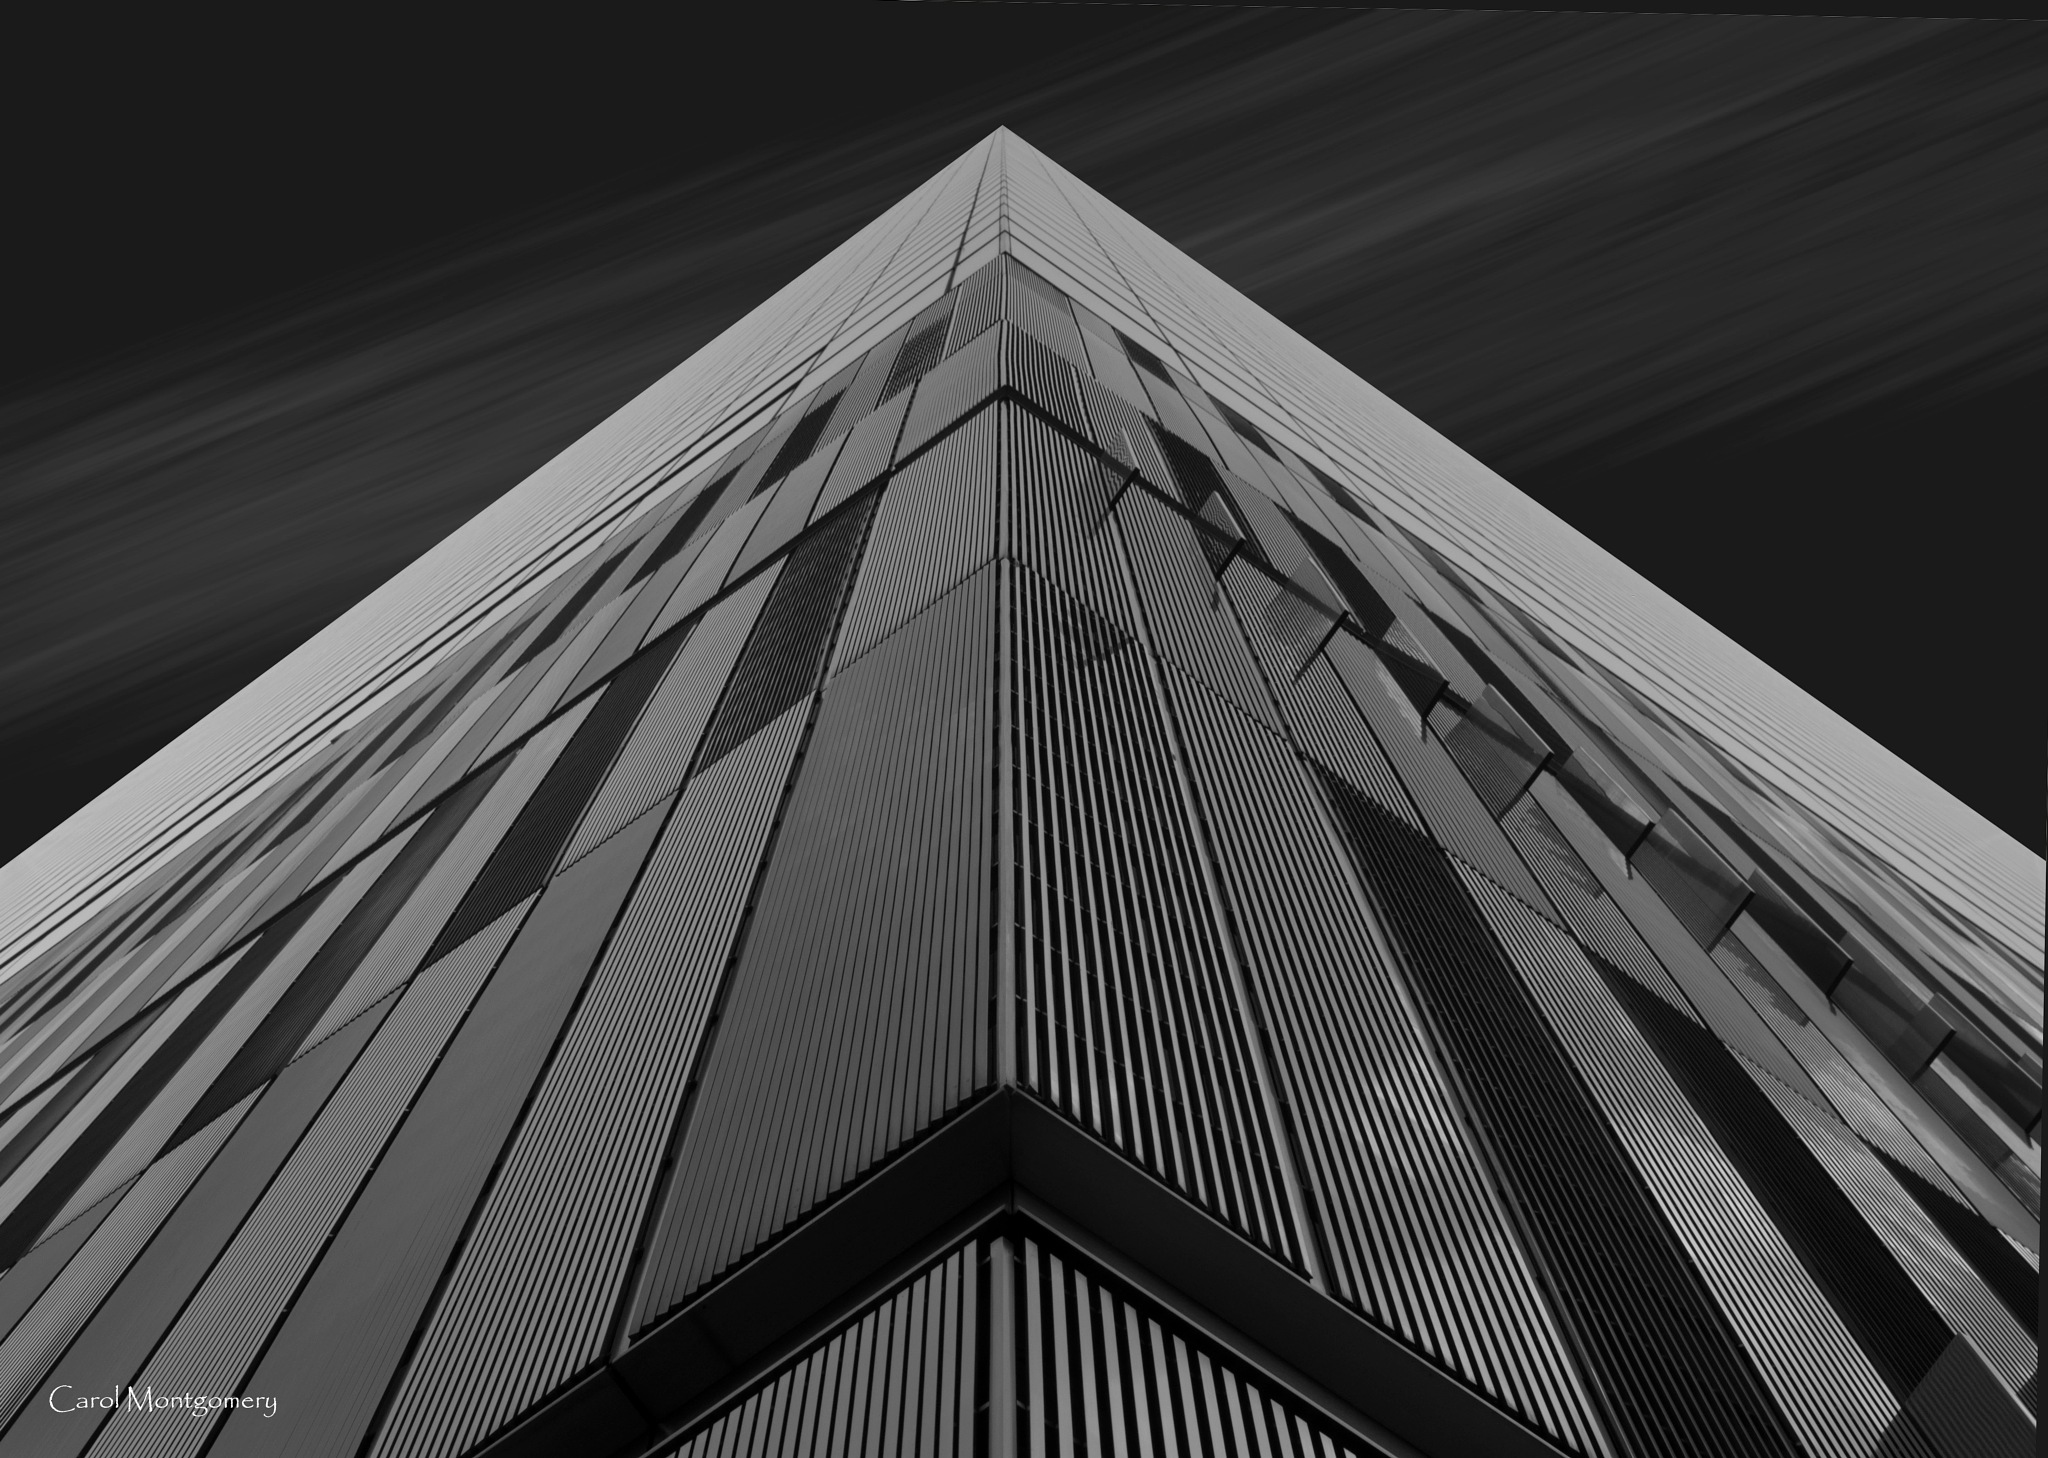 I love buildings by Carol Montgomery